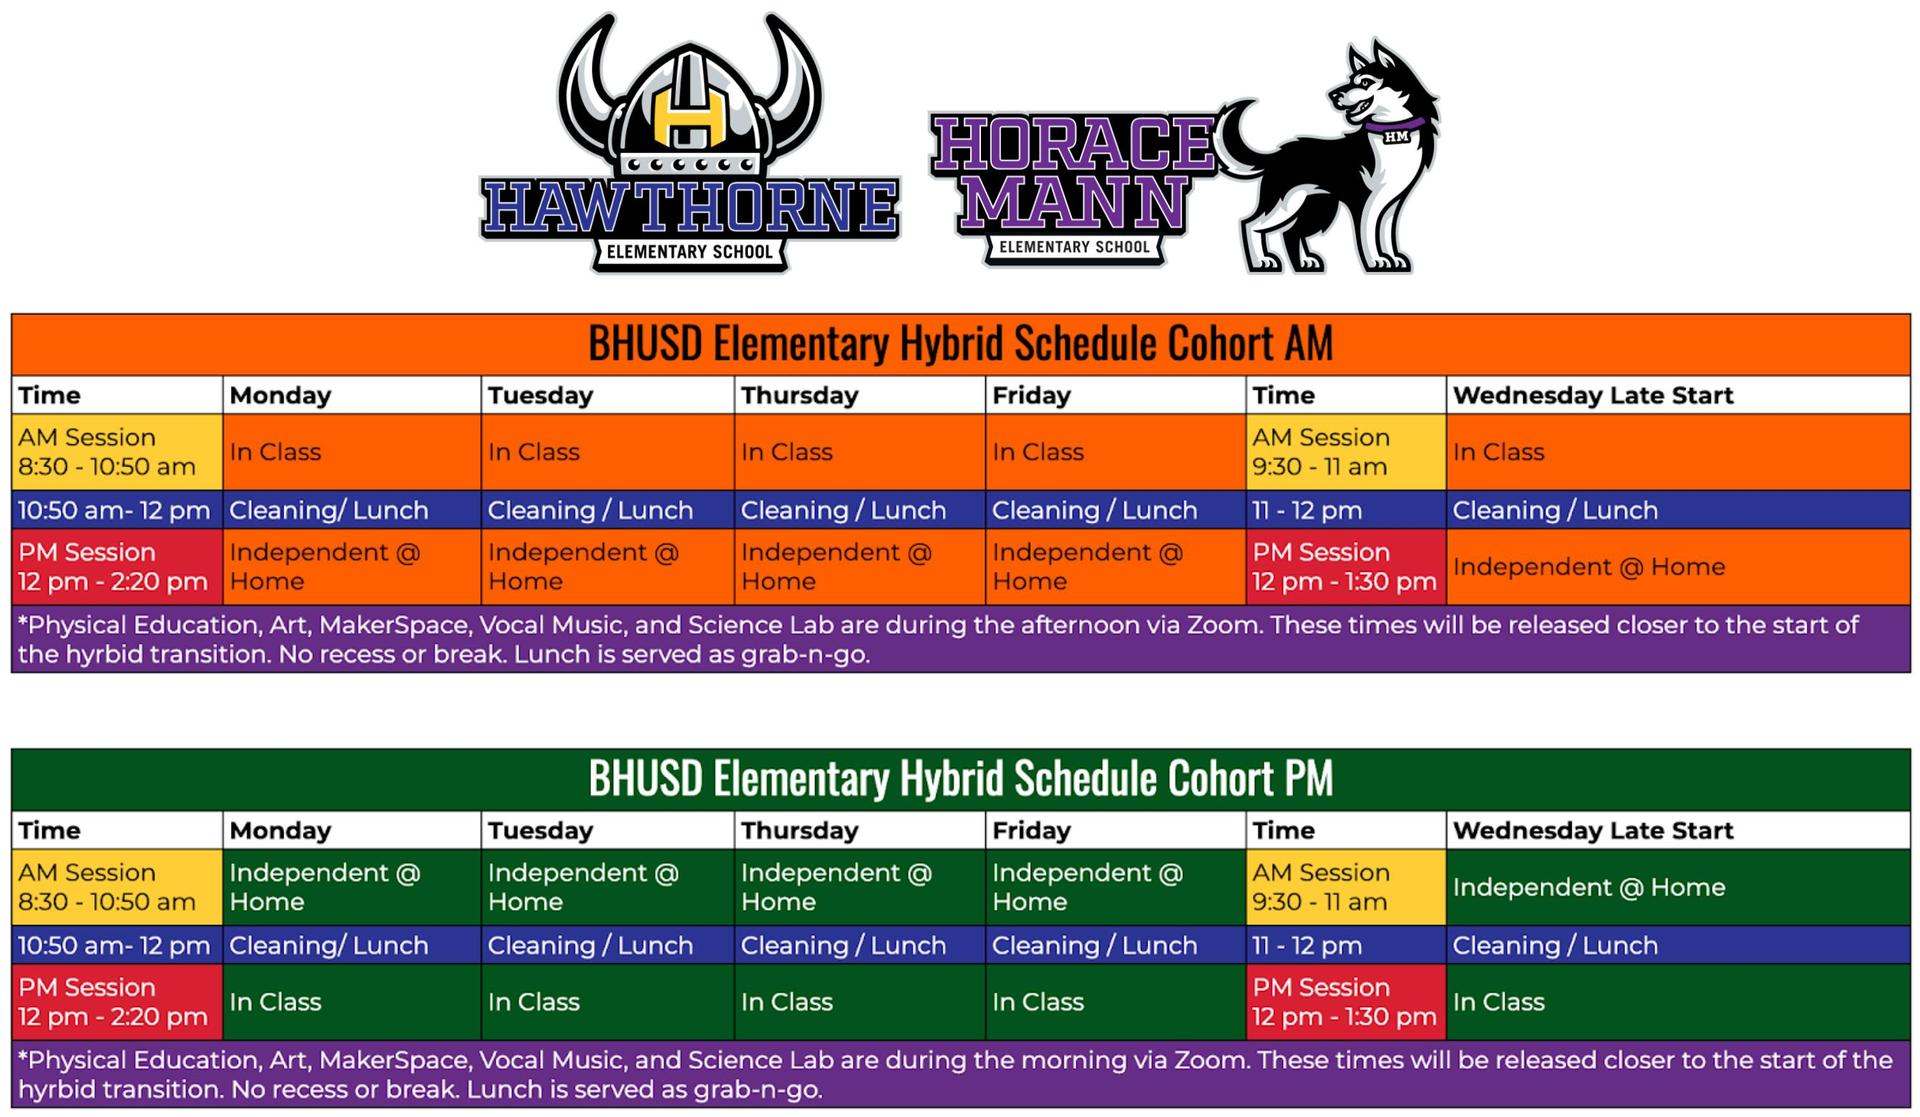 Elementary Hybrid Academic Schedule